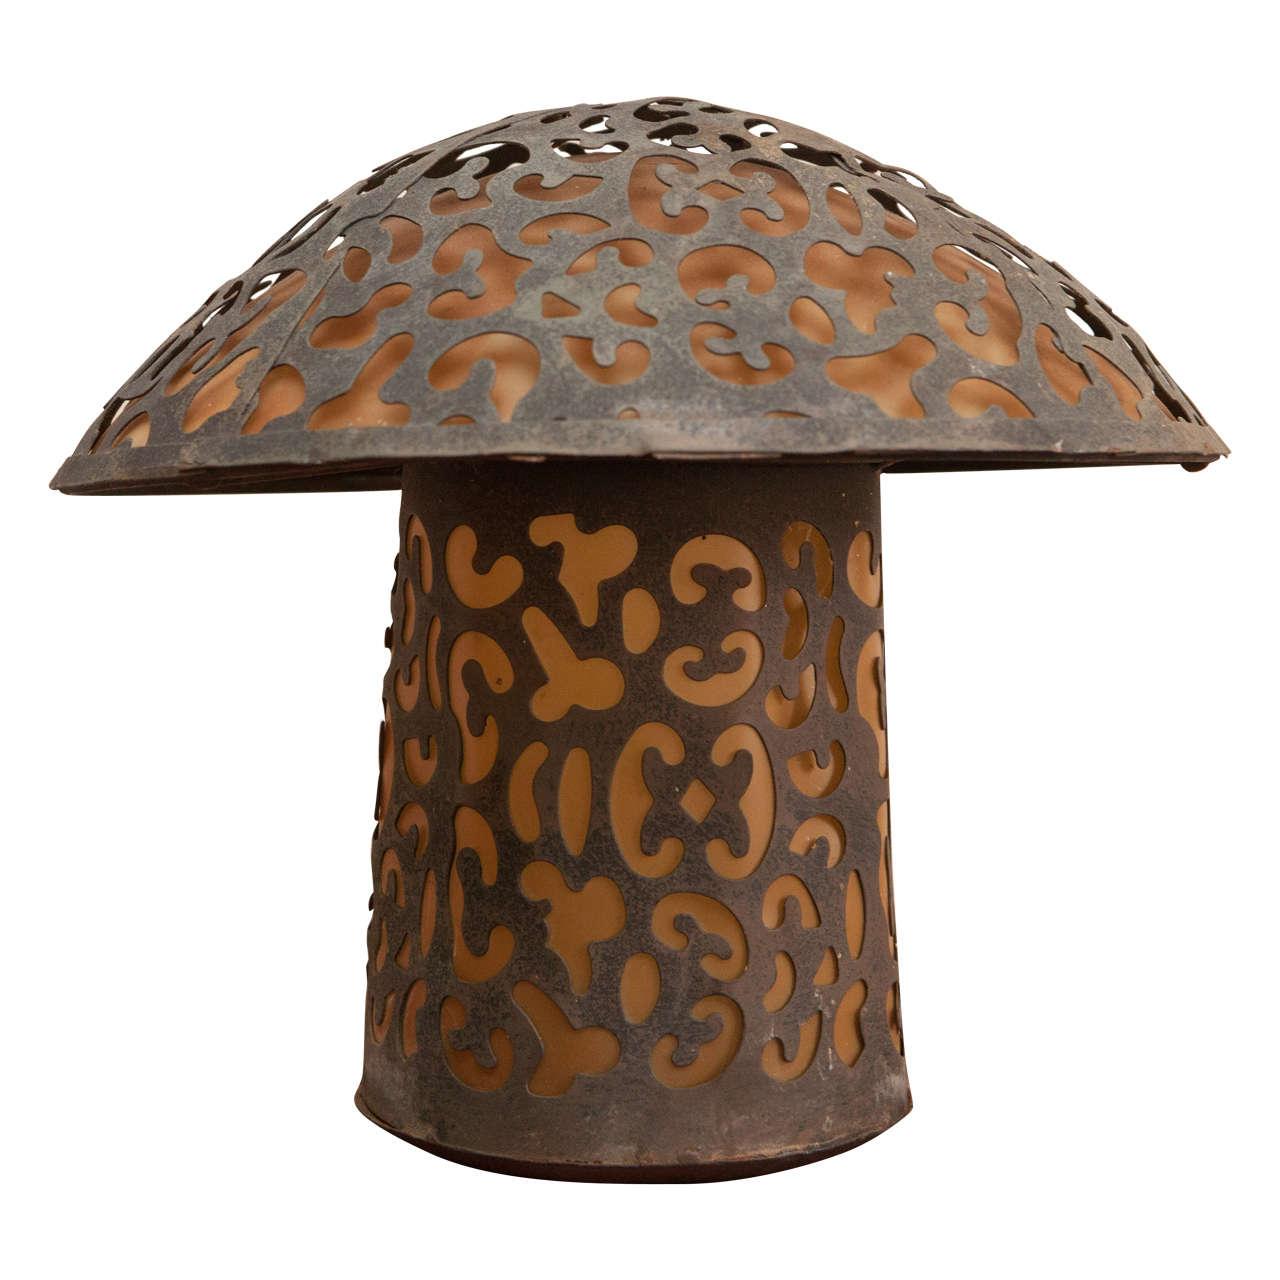 Antique Japanese Lantern Table Lamp At 1stdibs